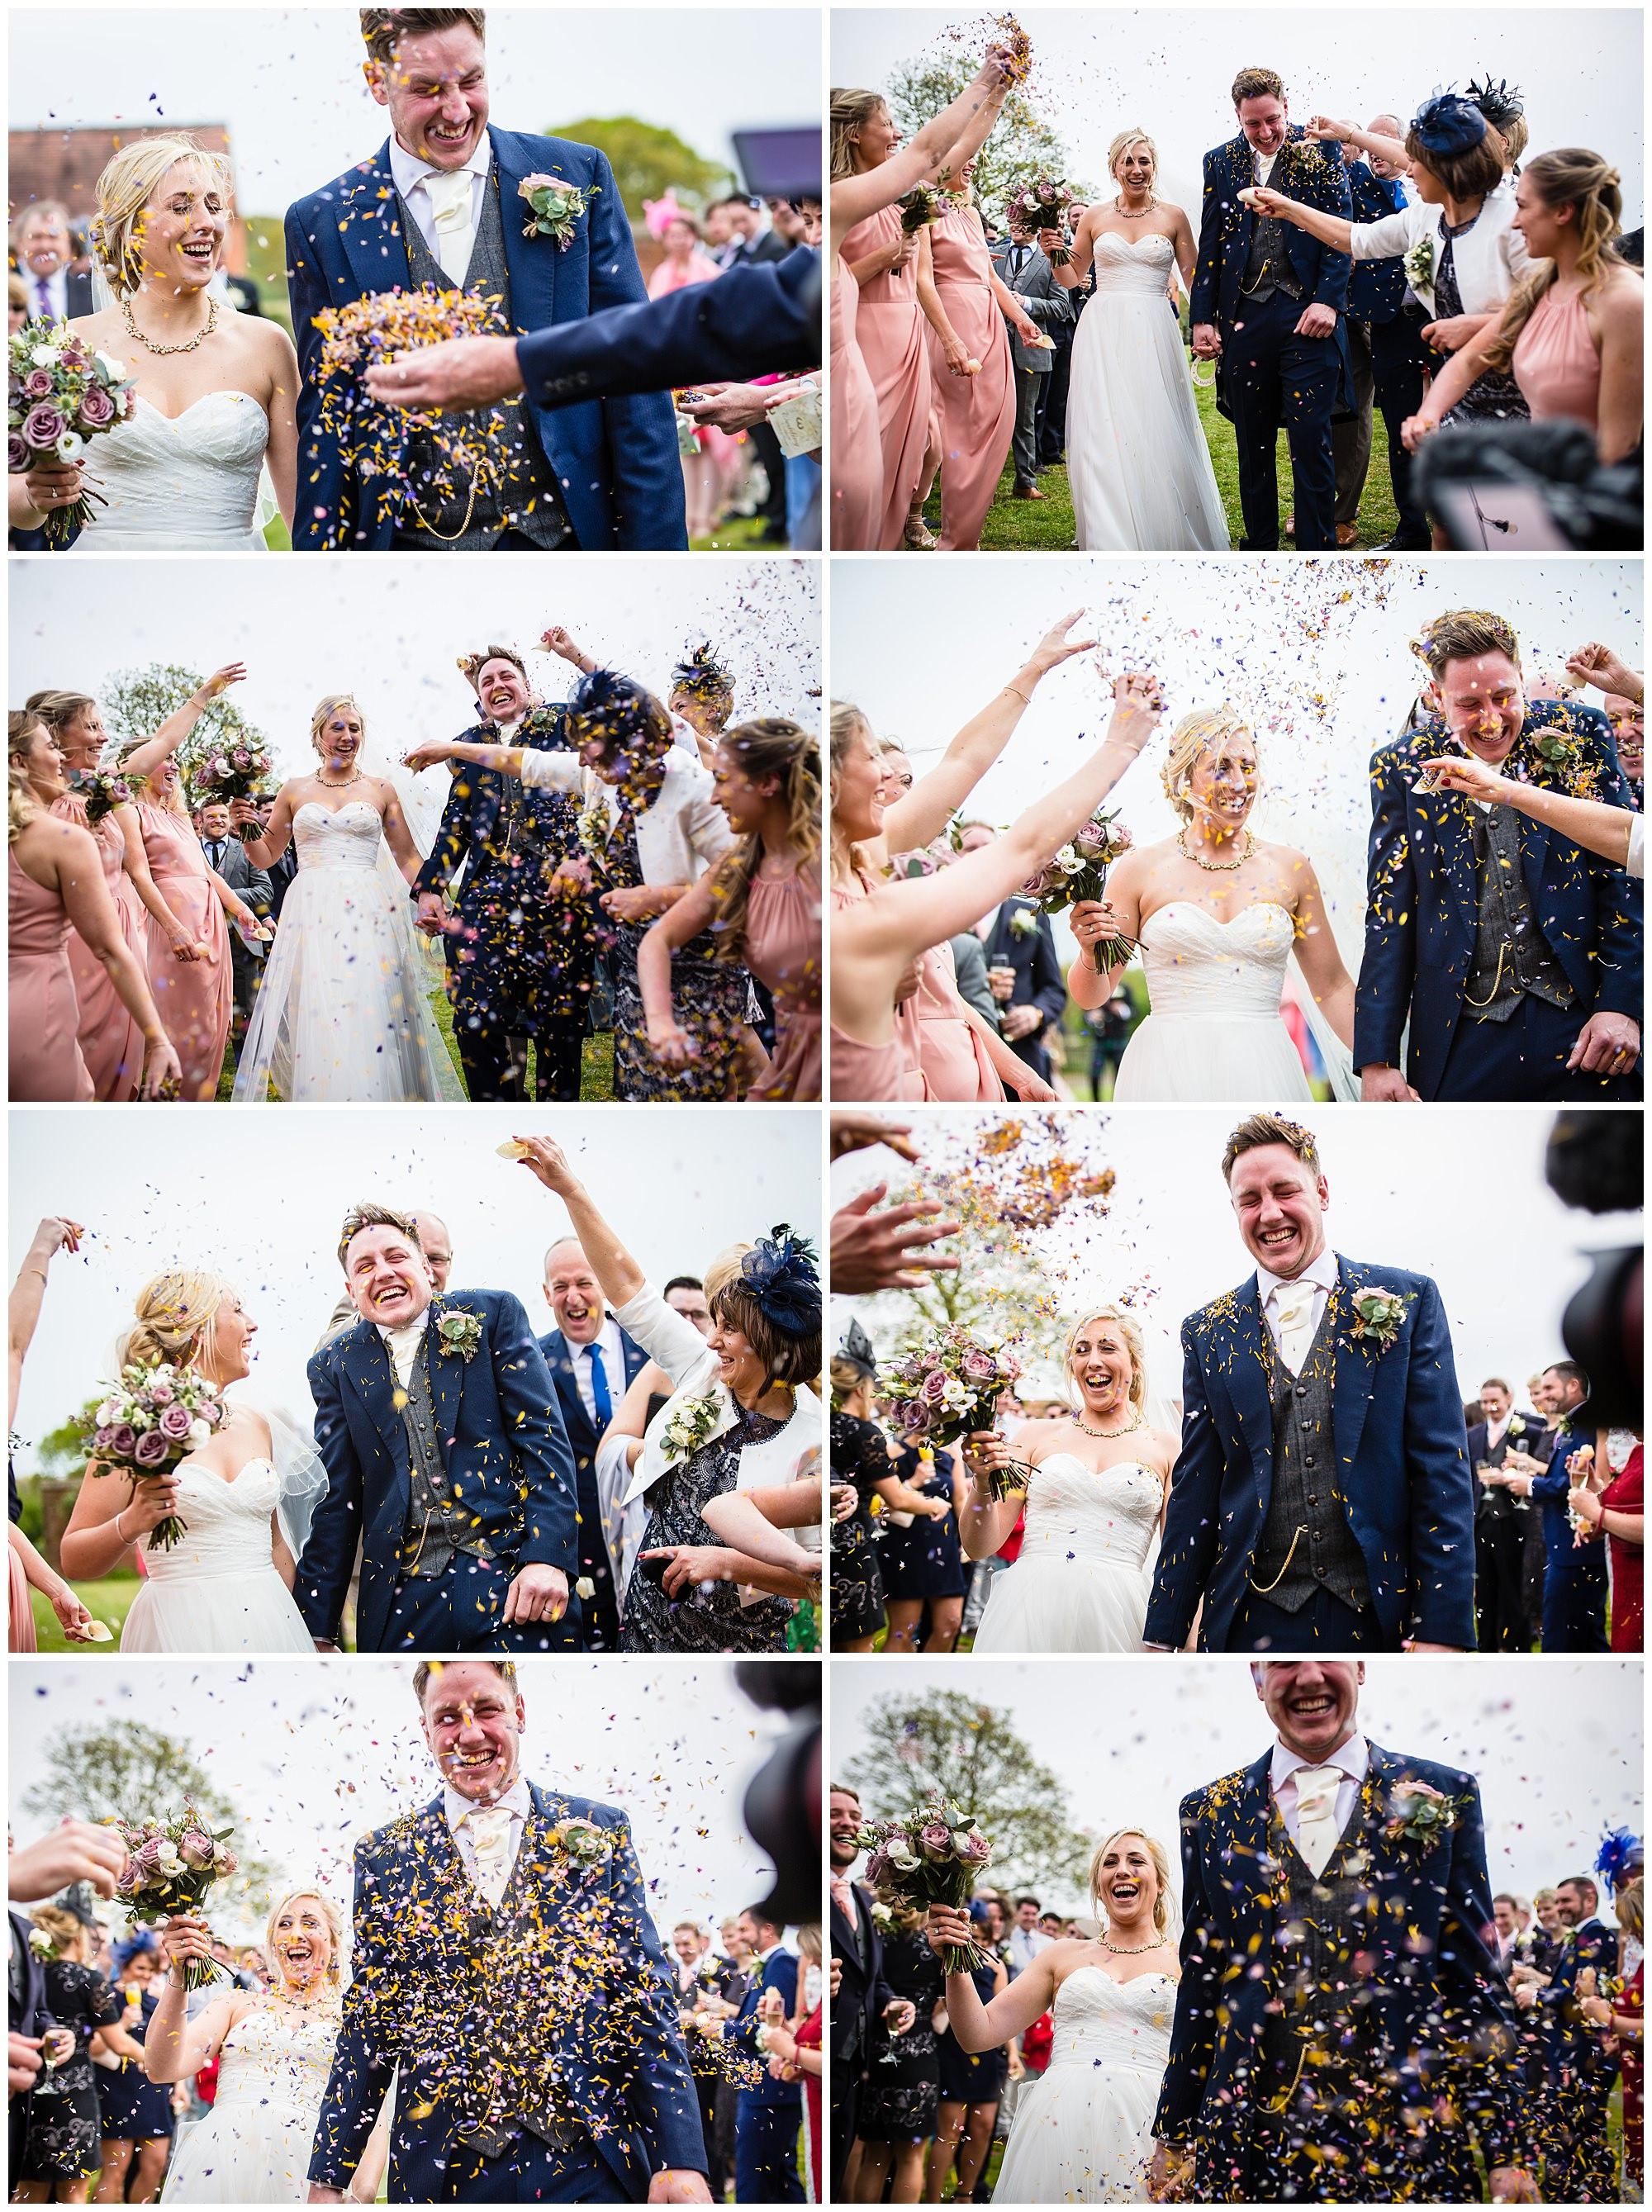 confetti photos outside soulton hall - shropshire wedding photographer